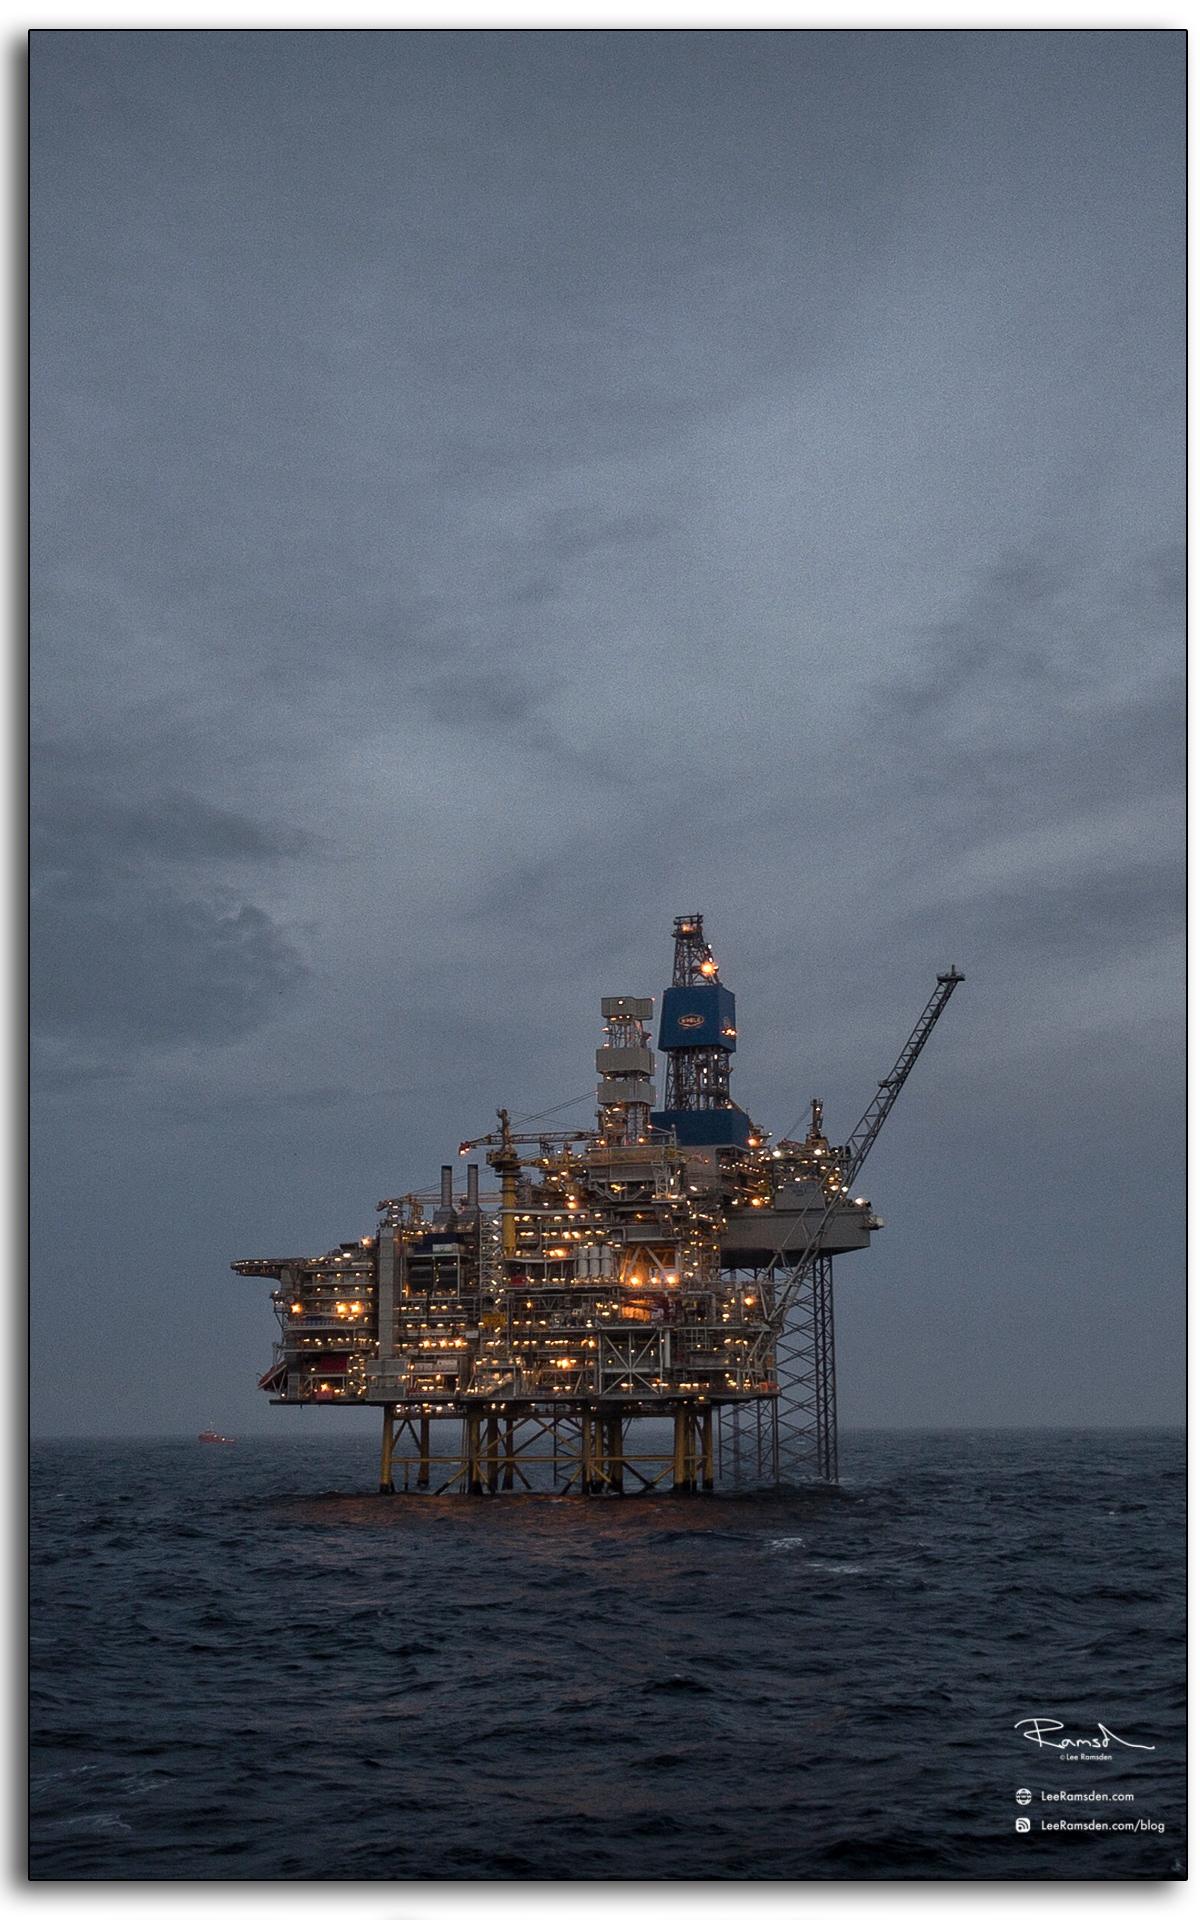 02 Marine, oil and gas, platform,  oil rig, equinor,  northsea.jpg